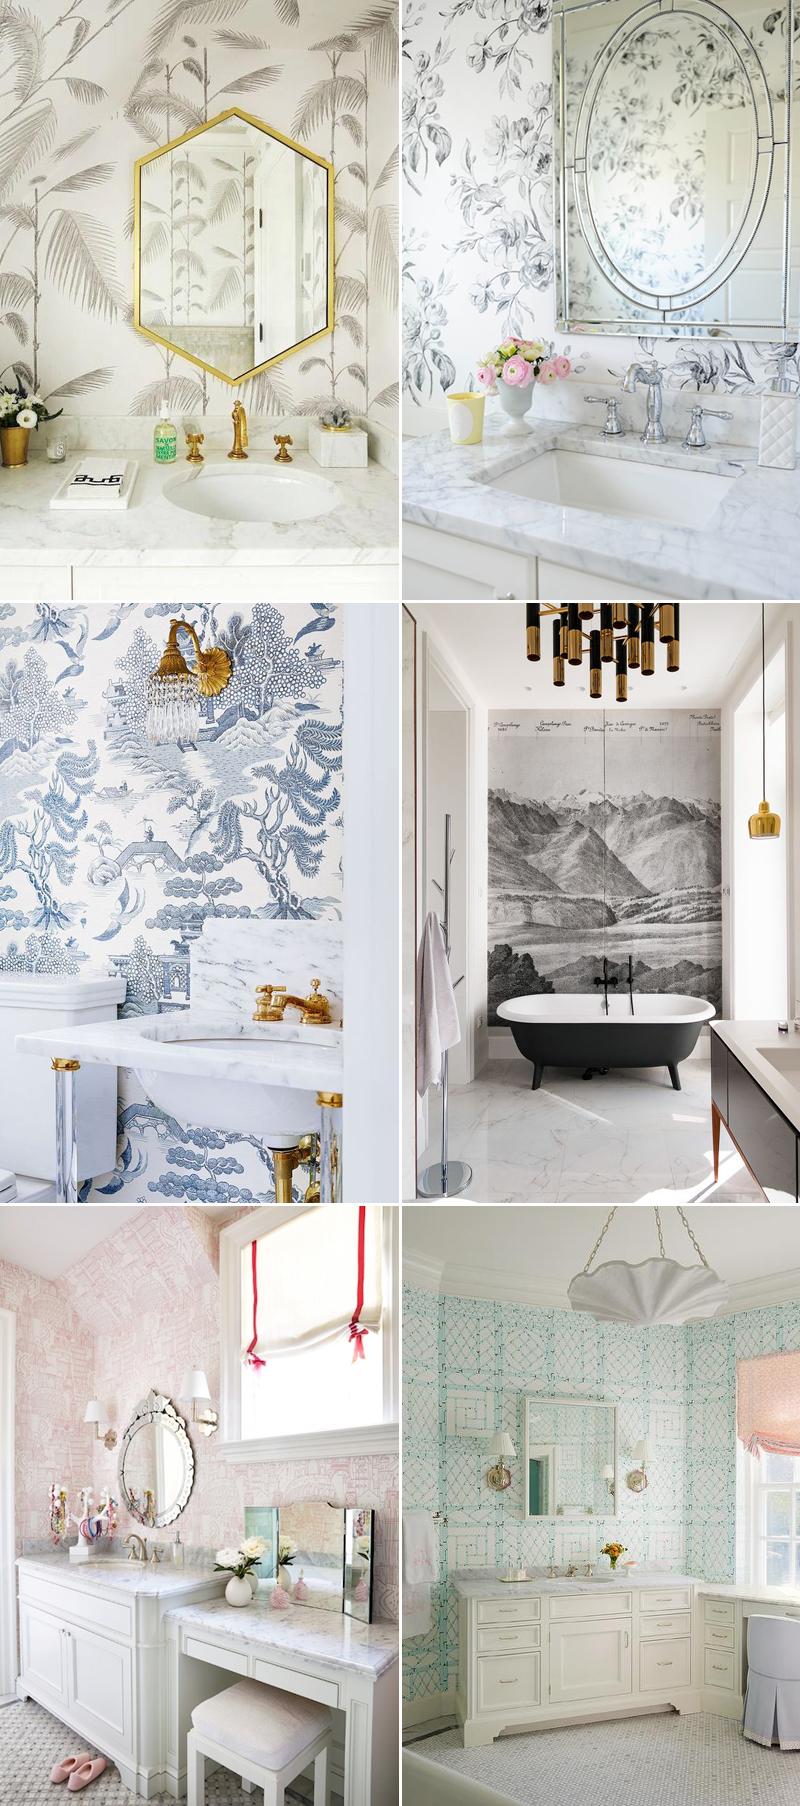 luxurybathroom04-wallpaper